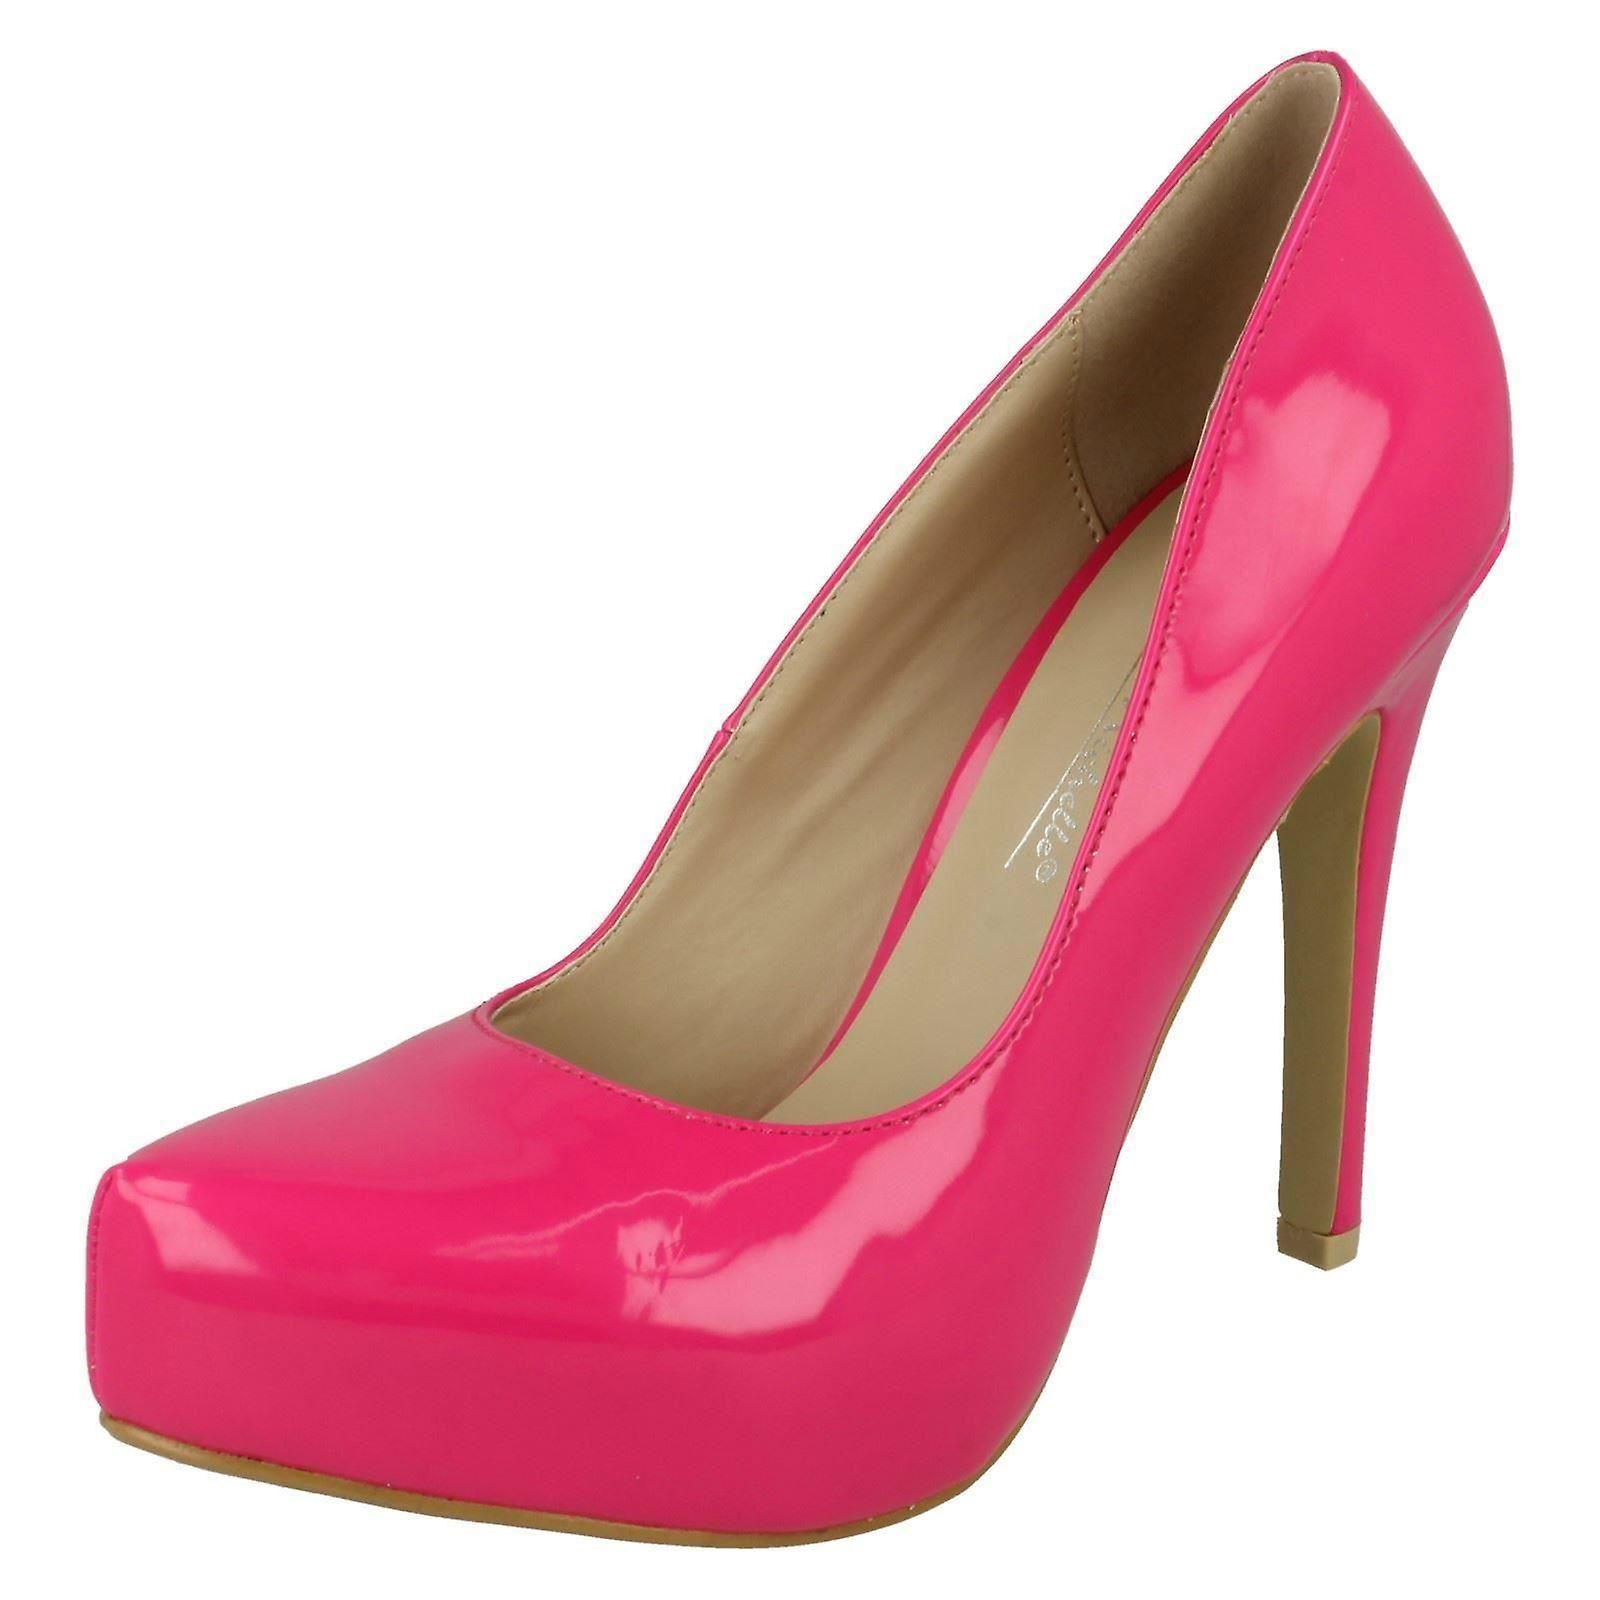 Shoes Court Patent Anne Michelle F9775 Ladies Ag0Iwn